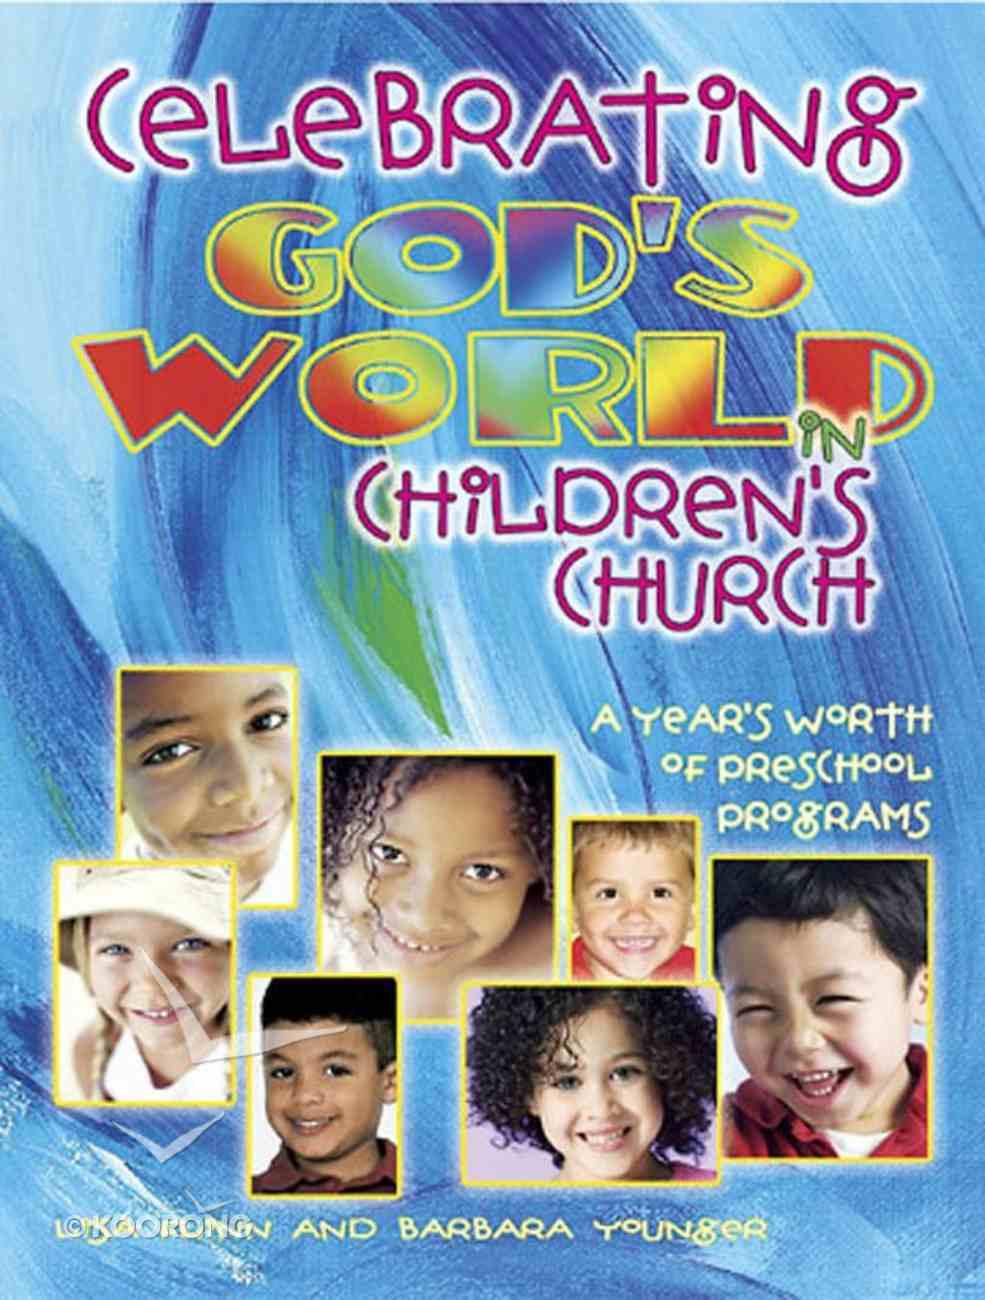 Celebrating God's World in Children's Church Paperback